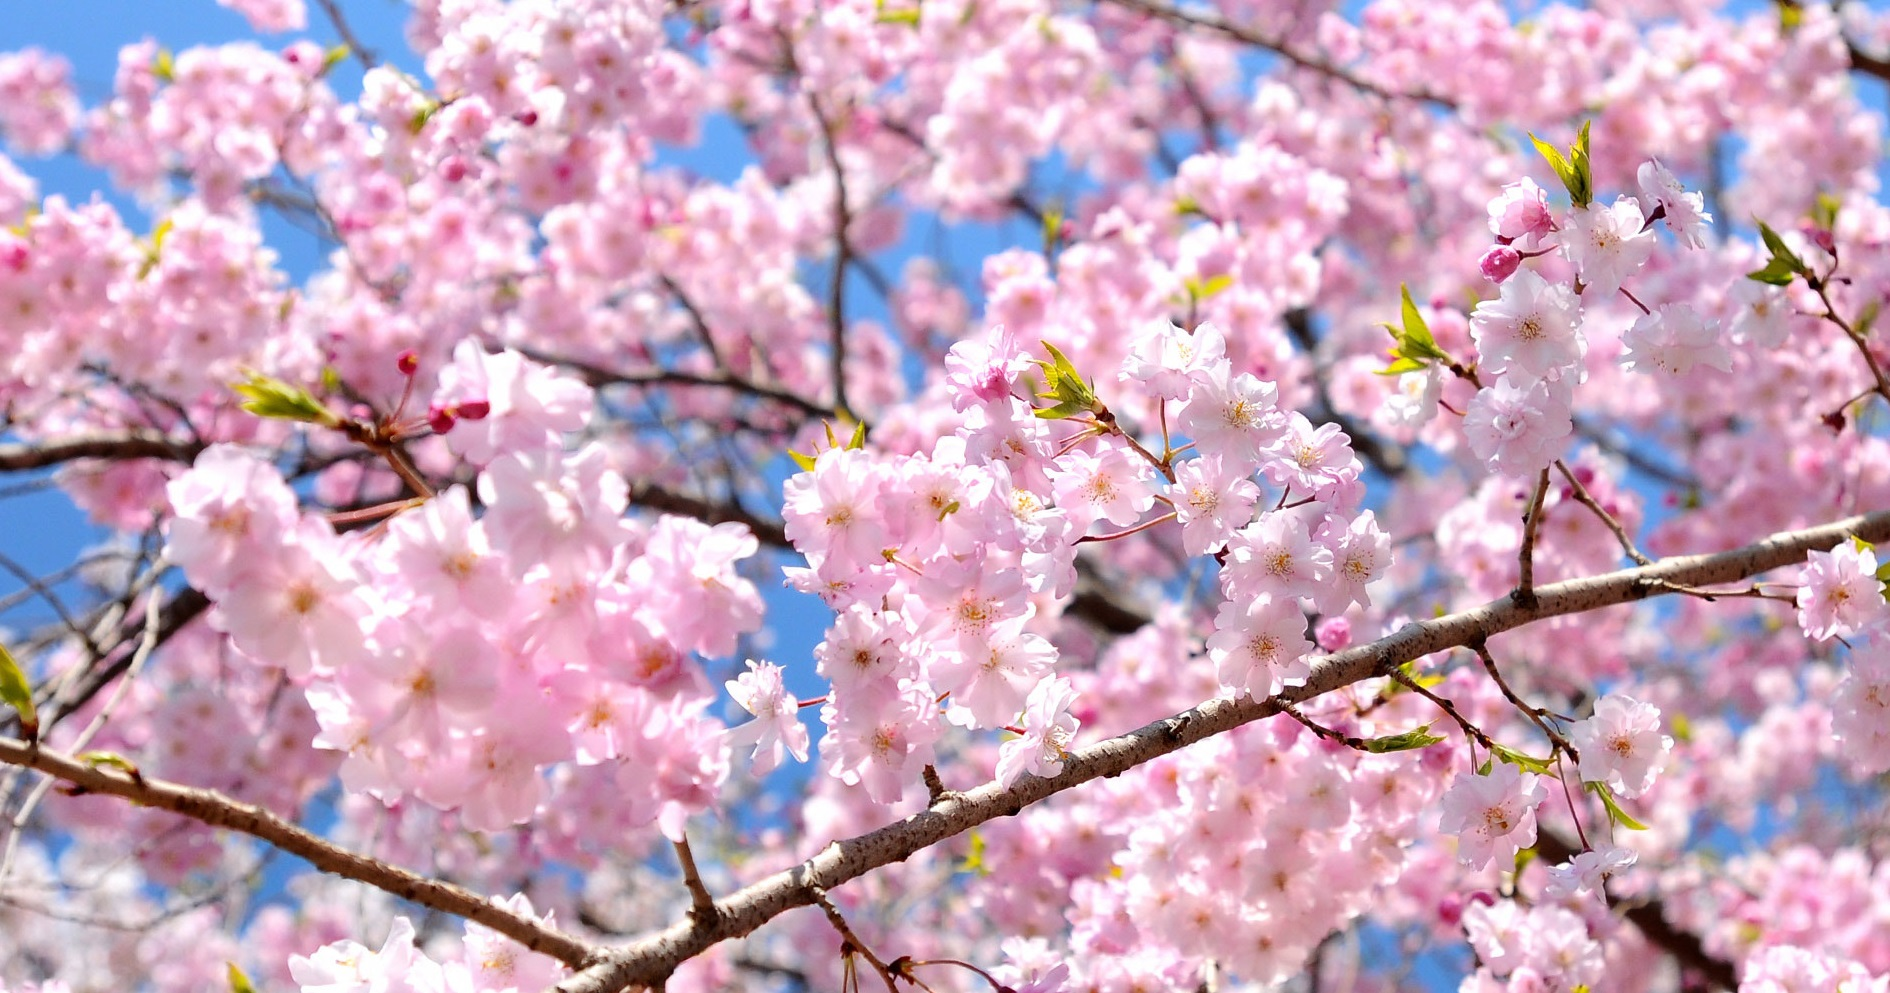 anime sakura cherry blossoms hanami season